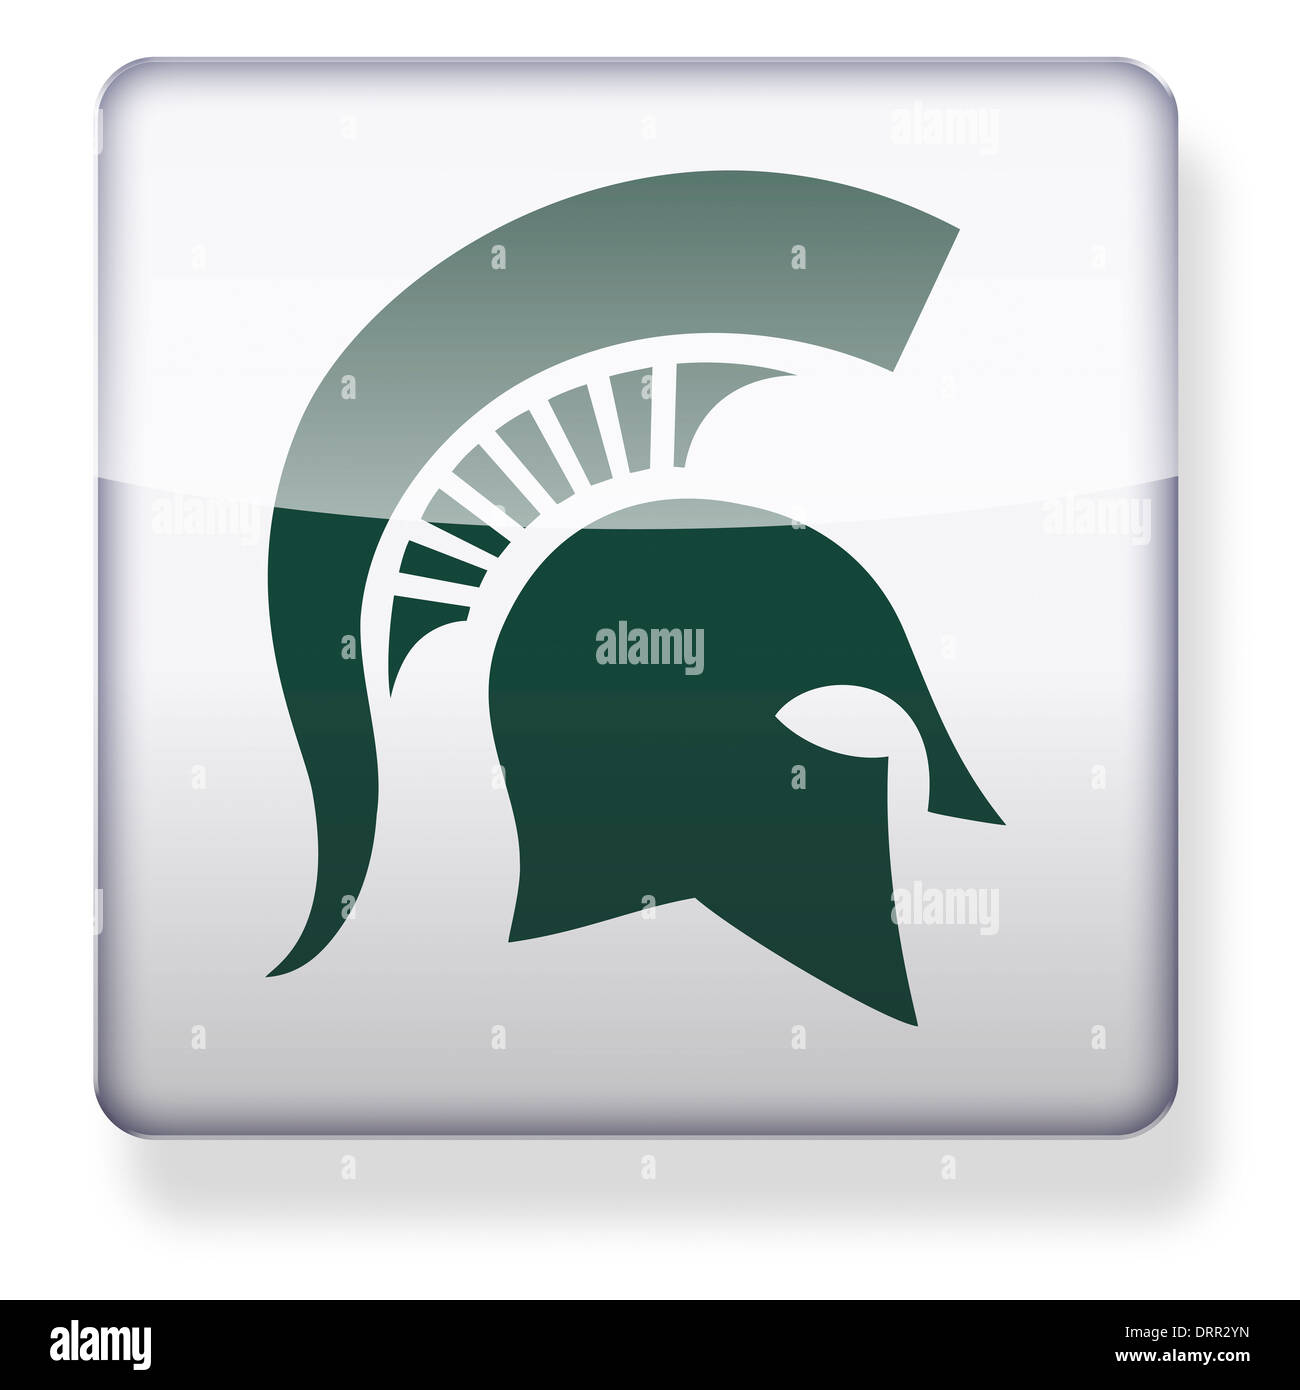 Michigan state spartans us college football logo as an app icon michigan state spartans us college football logo as an app icon clipping path included buycottarizona